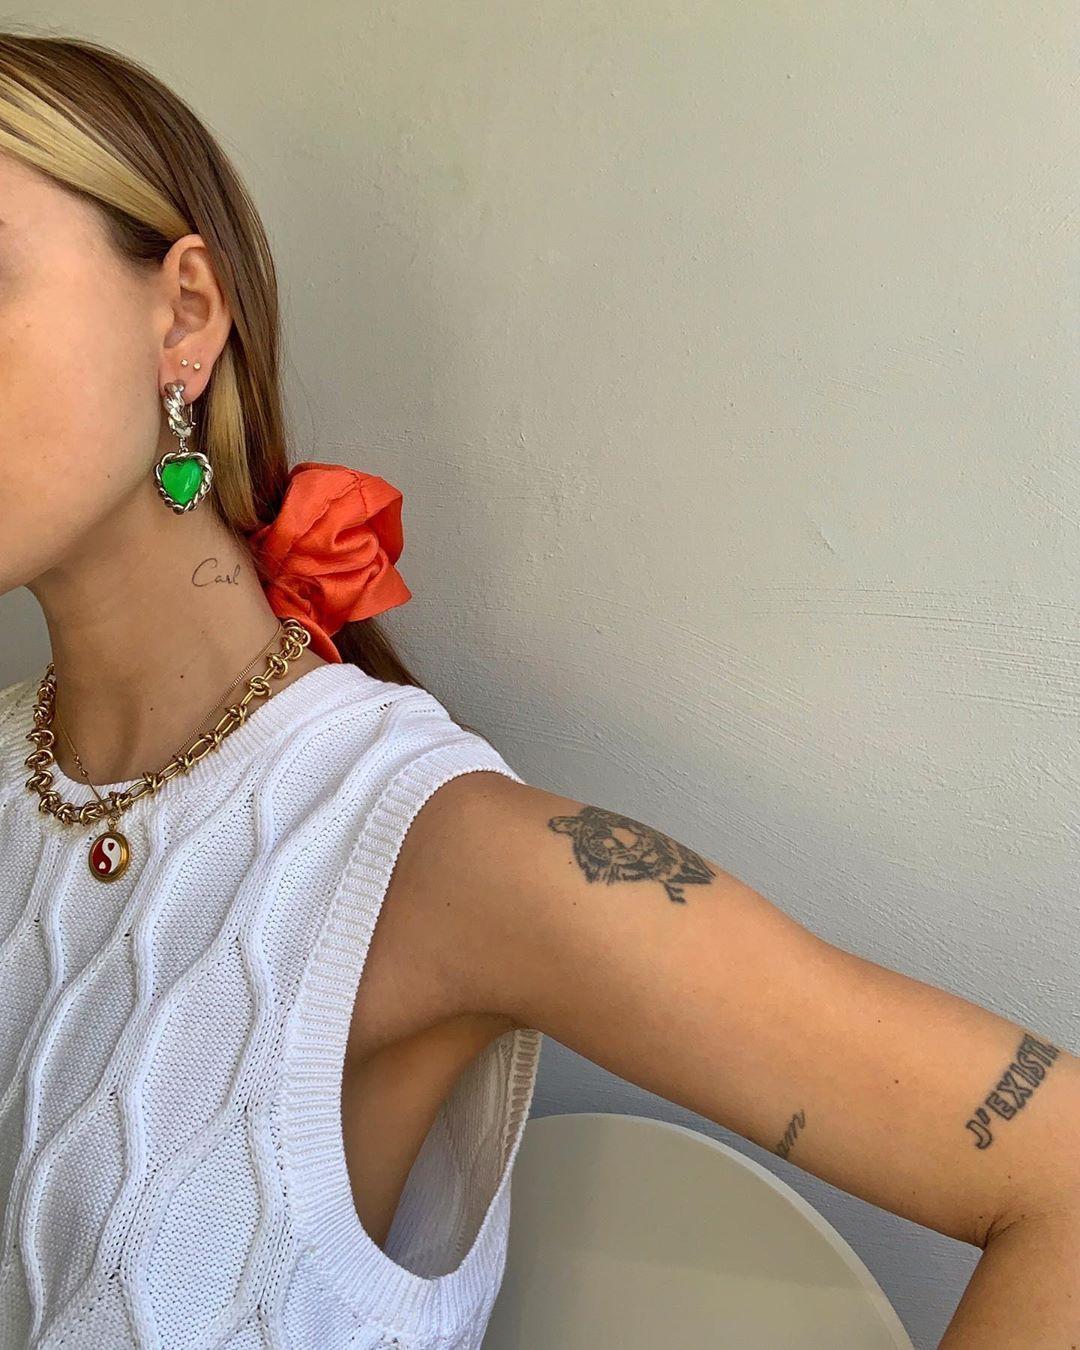 Кранч / instagram.com/annawinck